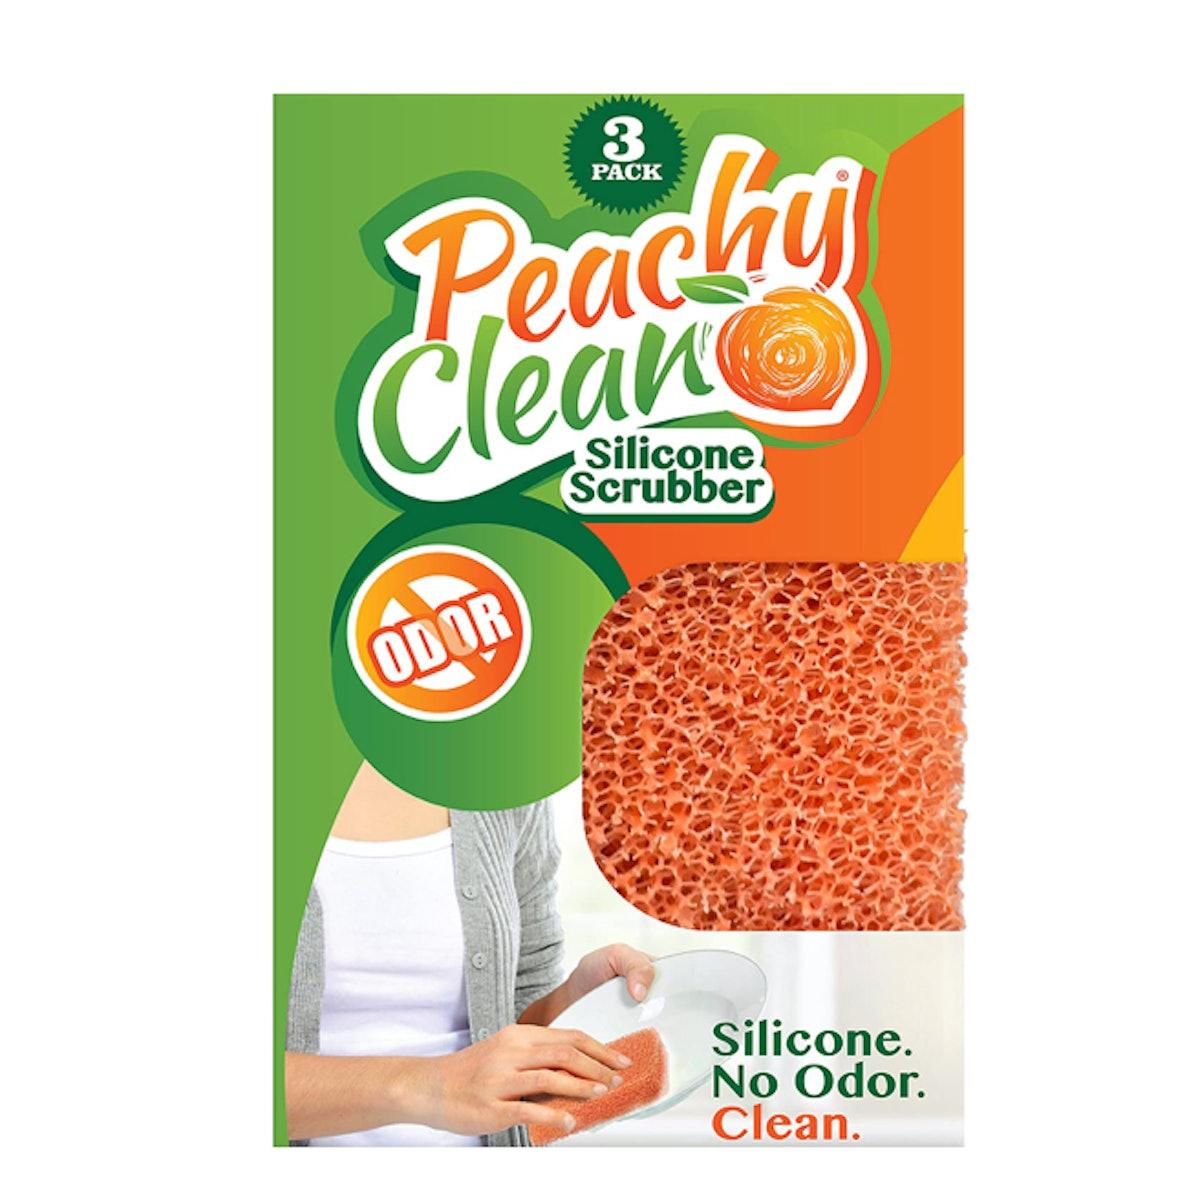 Peachy Clean Silicone Scrubber (3-Pack)